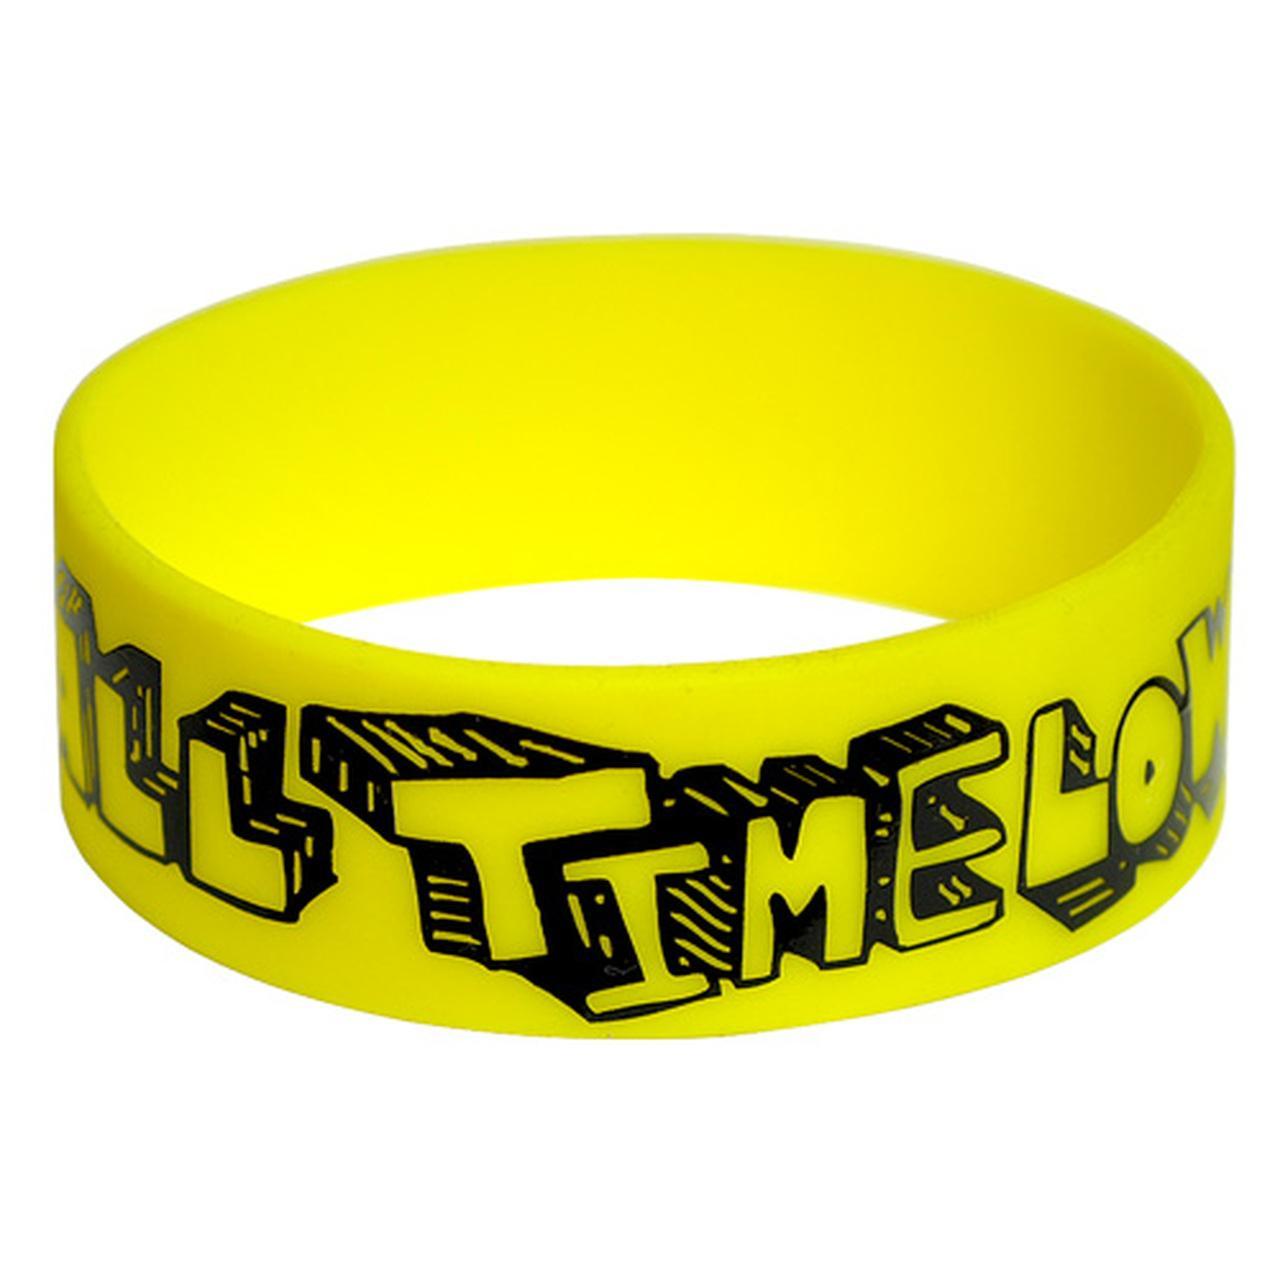 Custom Wide Silicone Wristbands | Screen Printed | LogoTags